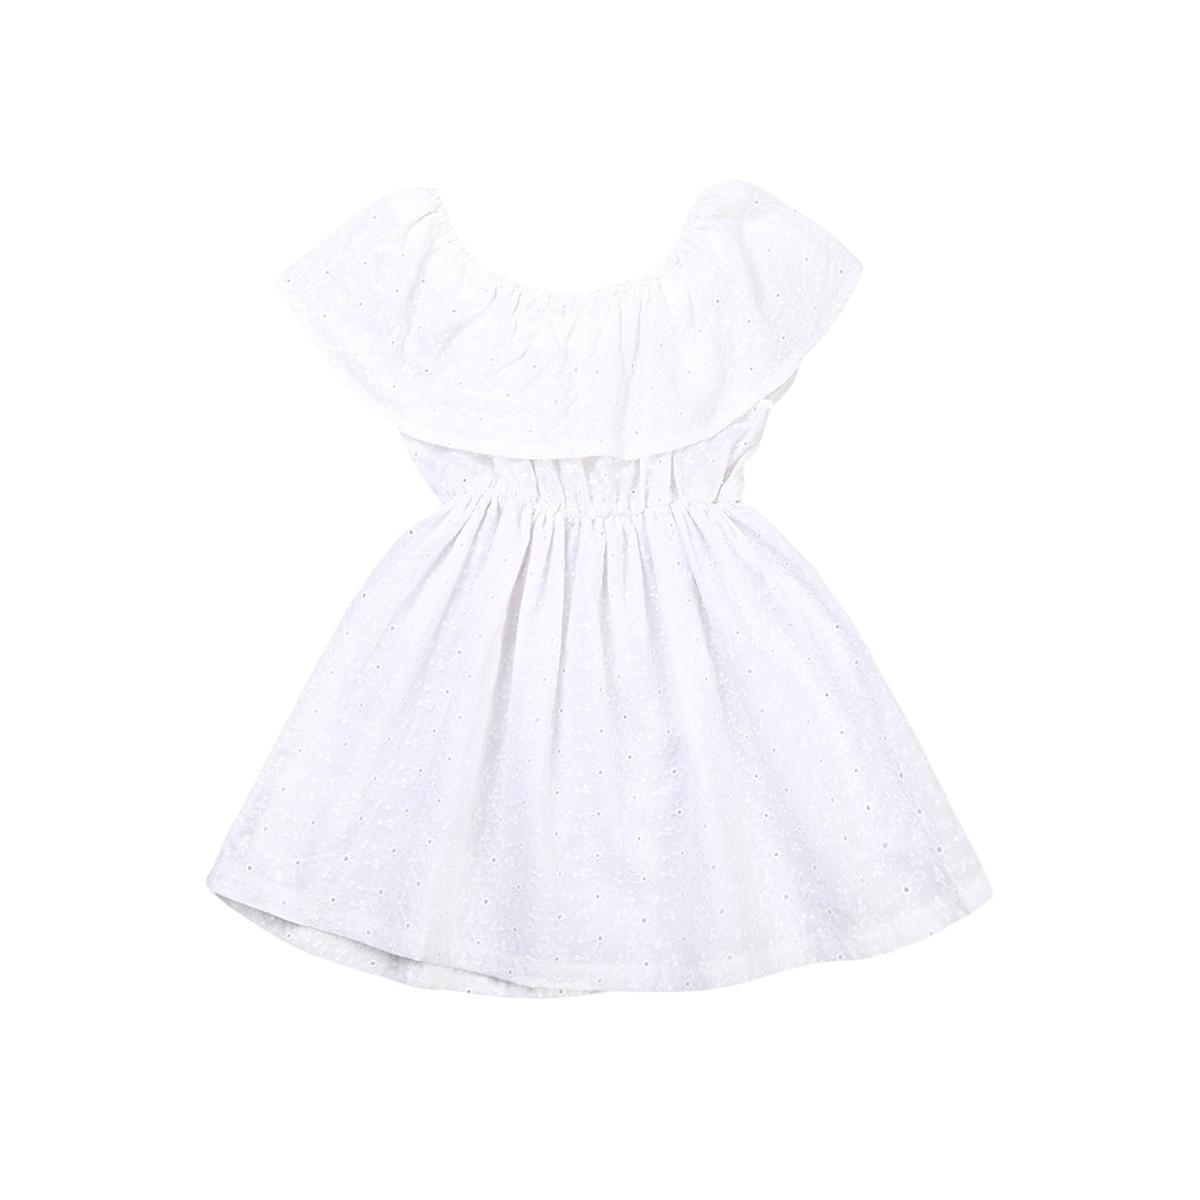 c09a2c9742012 معرض lace white drapes بسعر الجملة - اشتري قطع lace white drapes بسعر رخيص  على Aliexpress.com